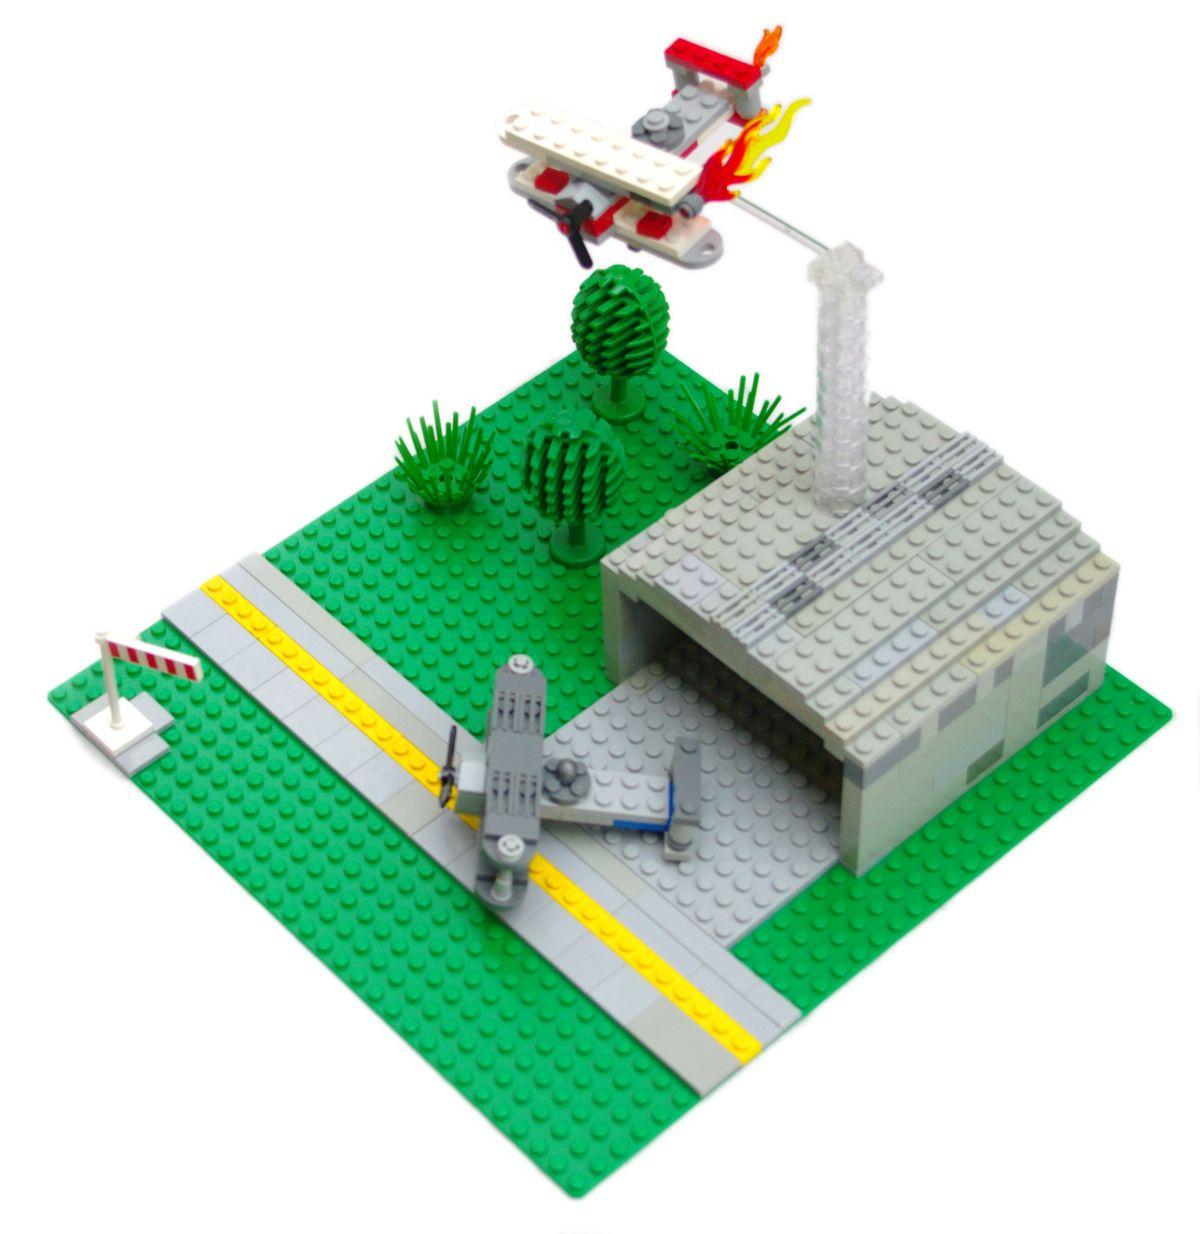 Concurs Microscale Old City – Creatia 7: Baza aeriana cu biplane